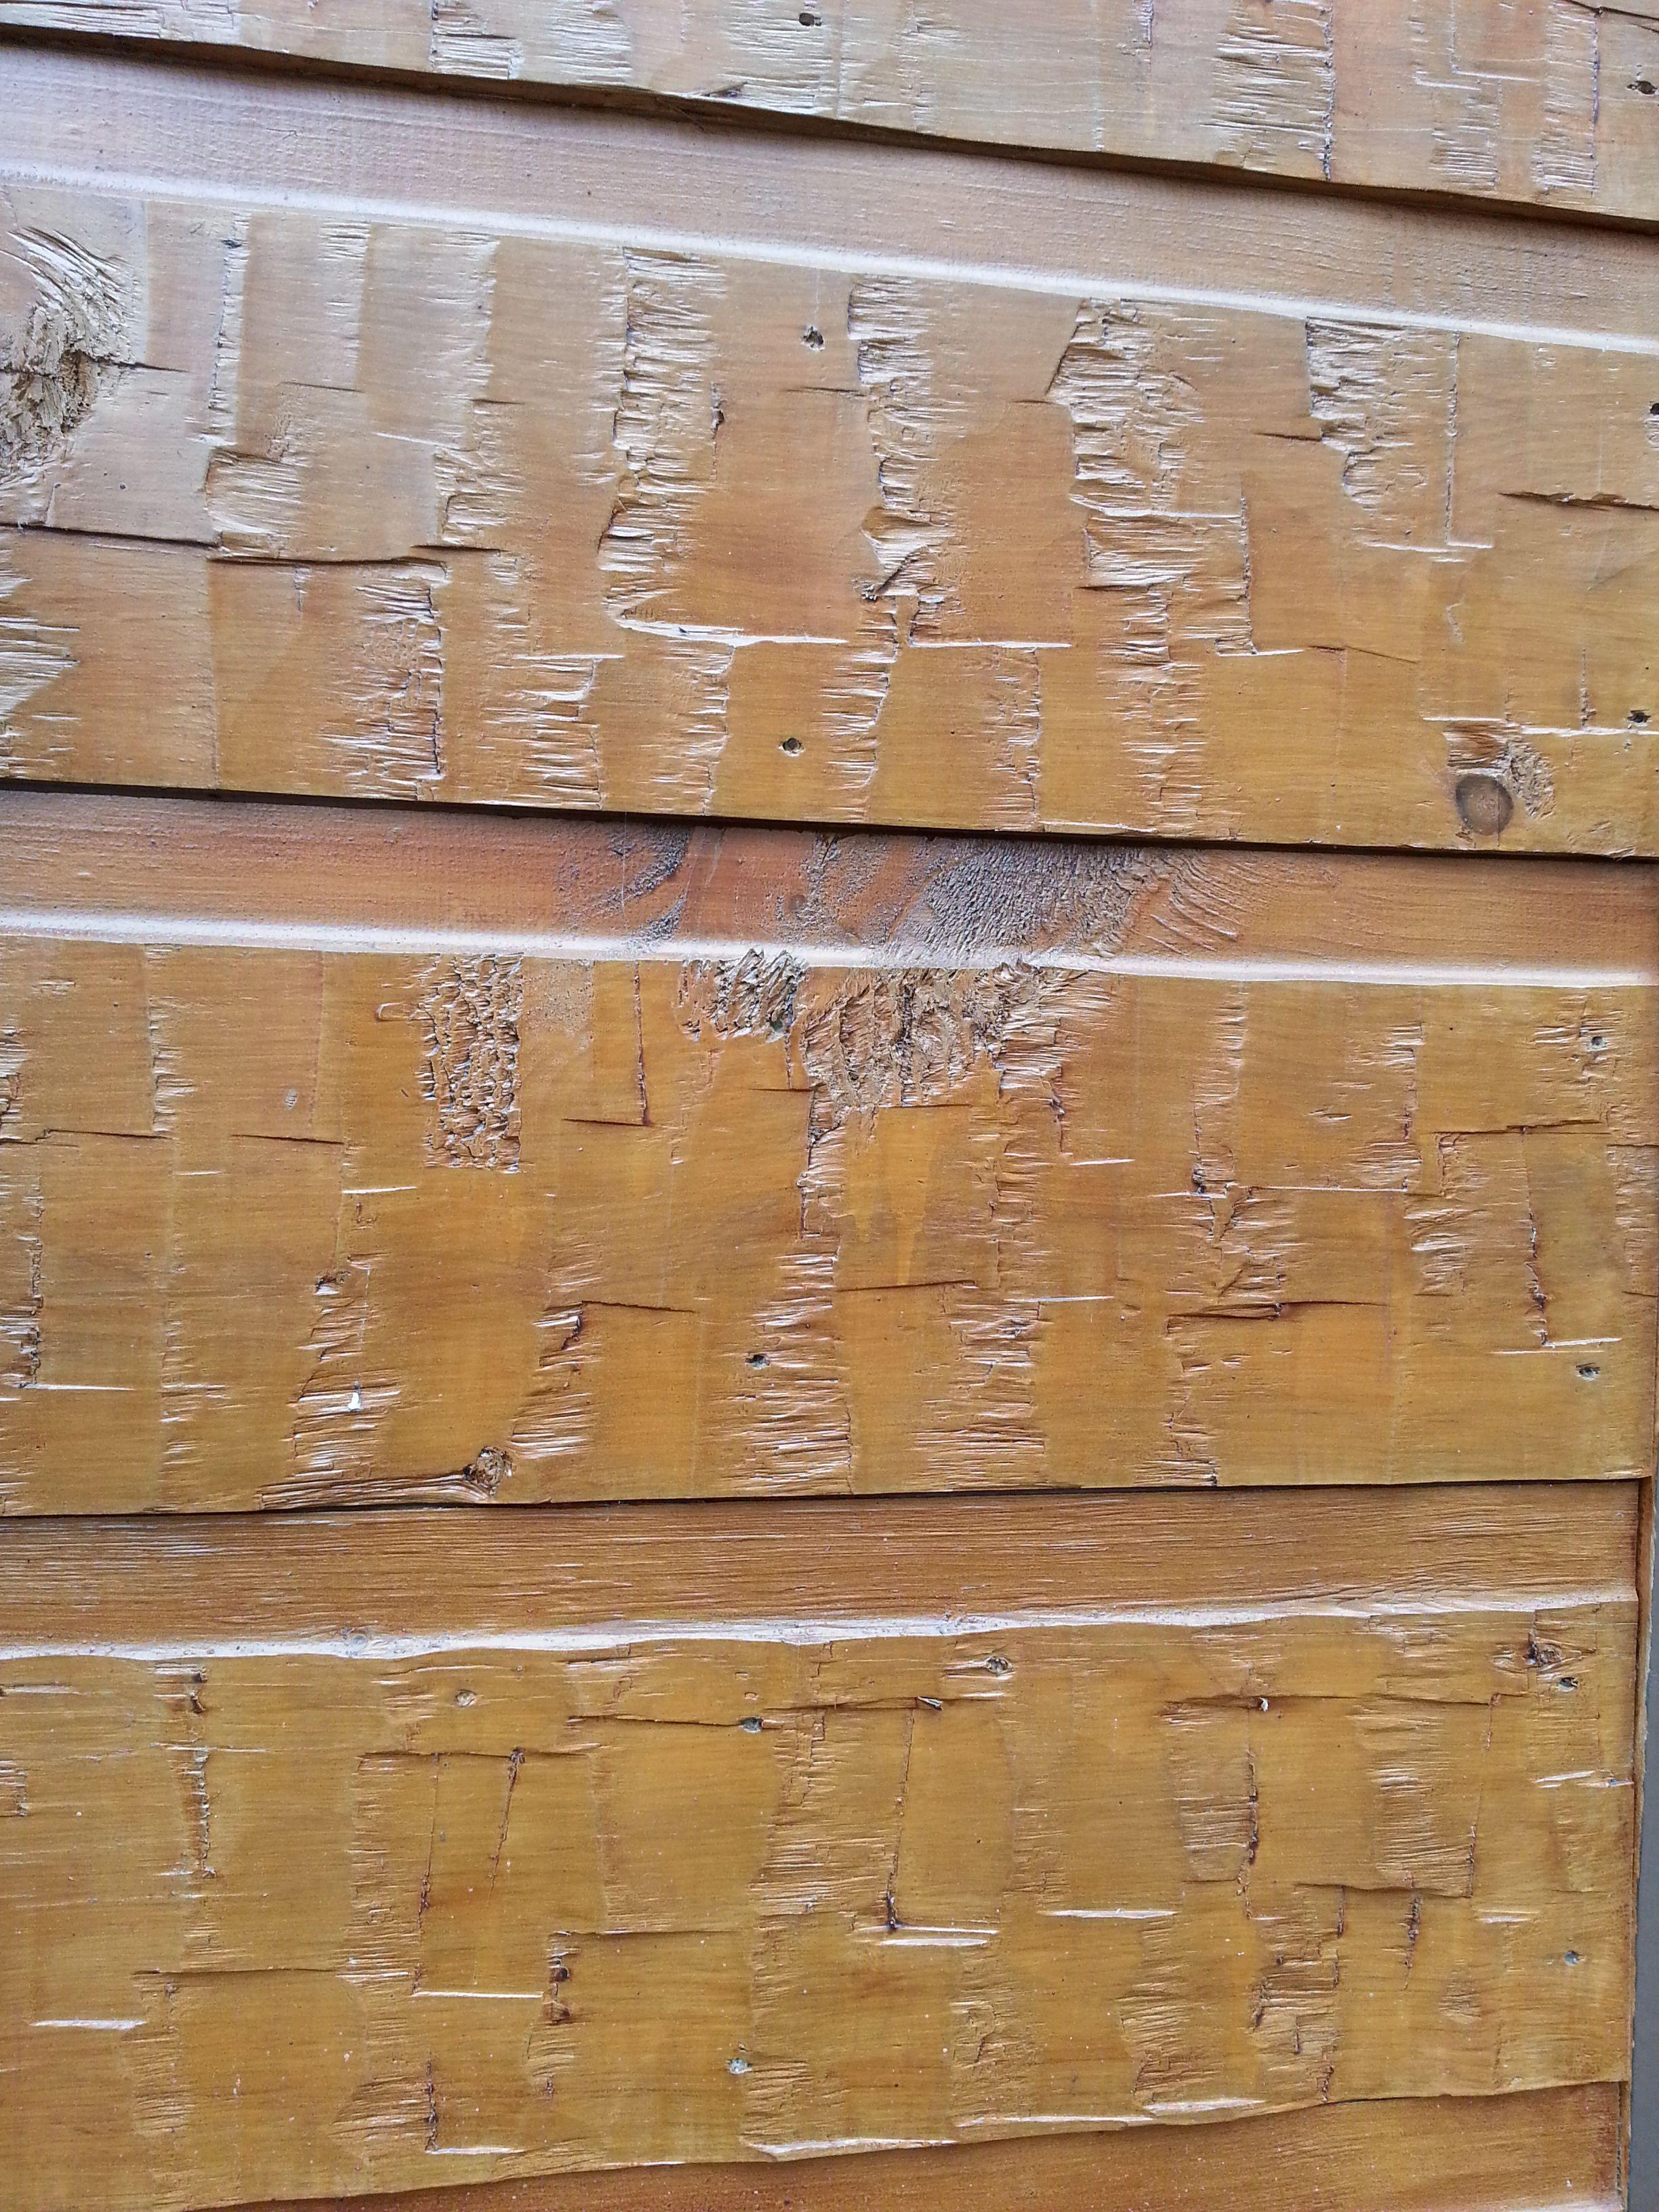 3x8 log siding hand hewn pine - Hand Hewn Log Siding With Chink Groove And Hand Hewn Finish